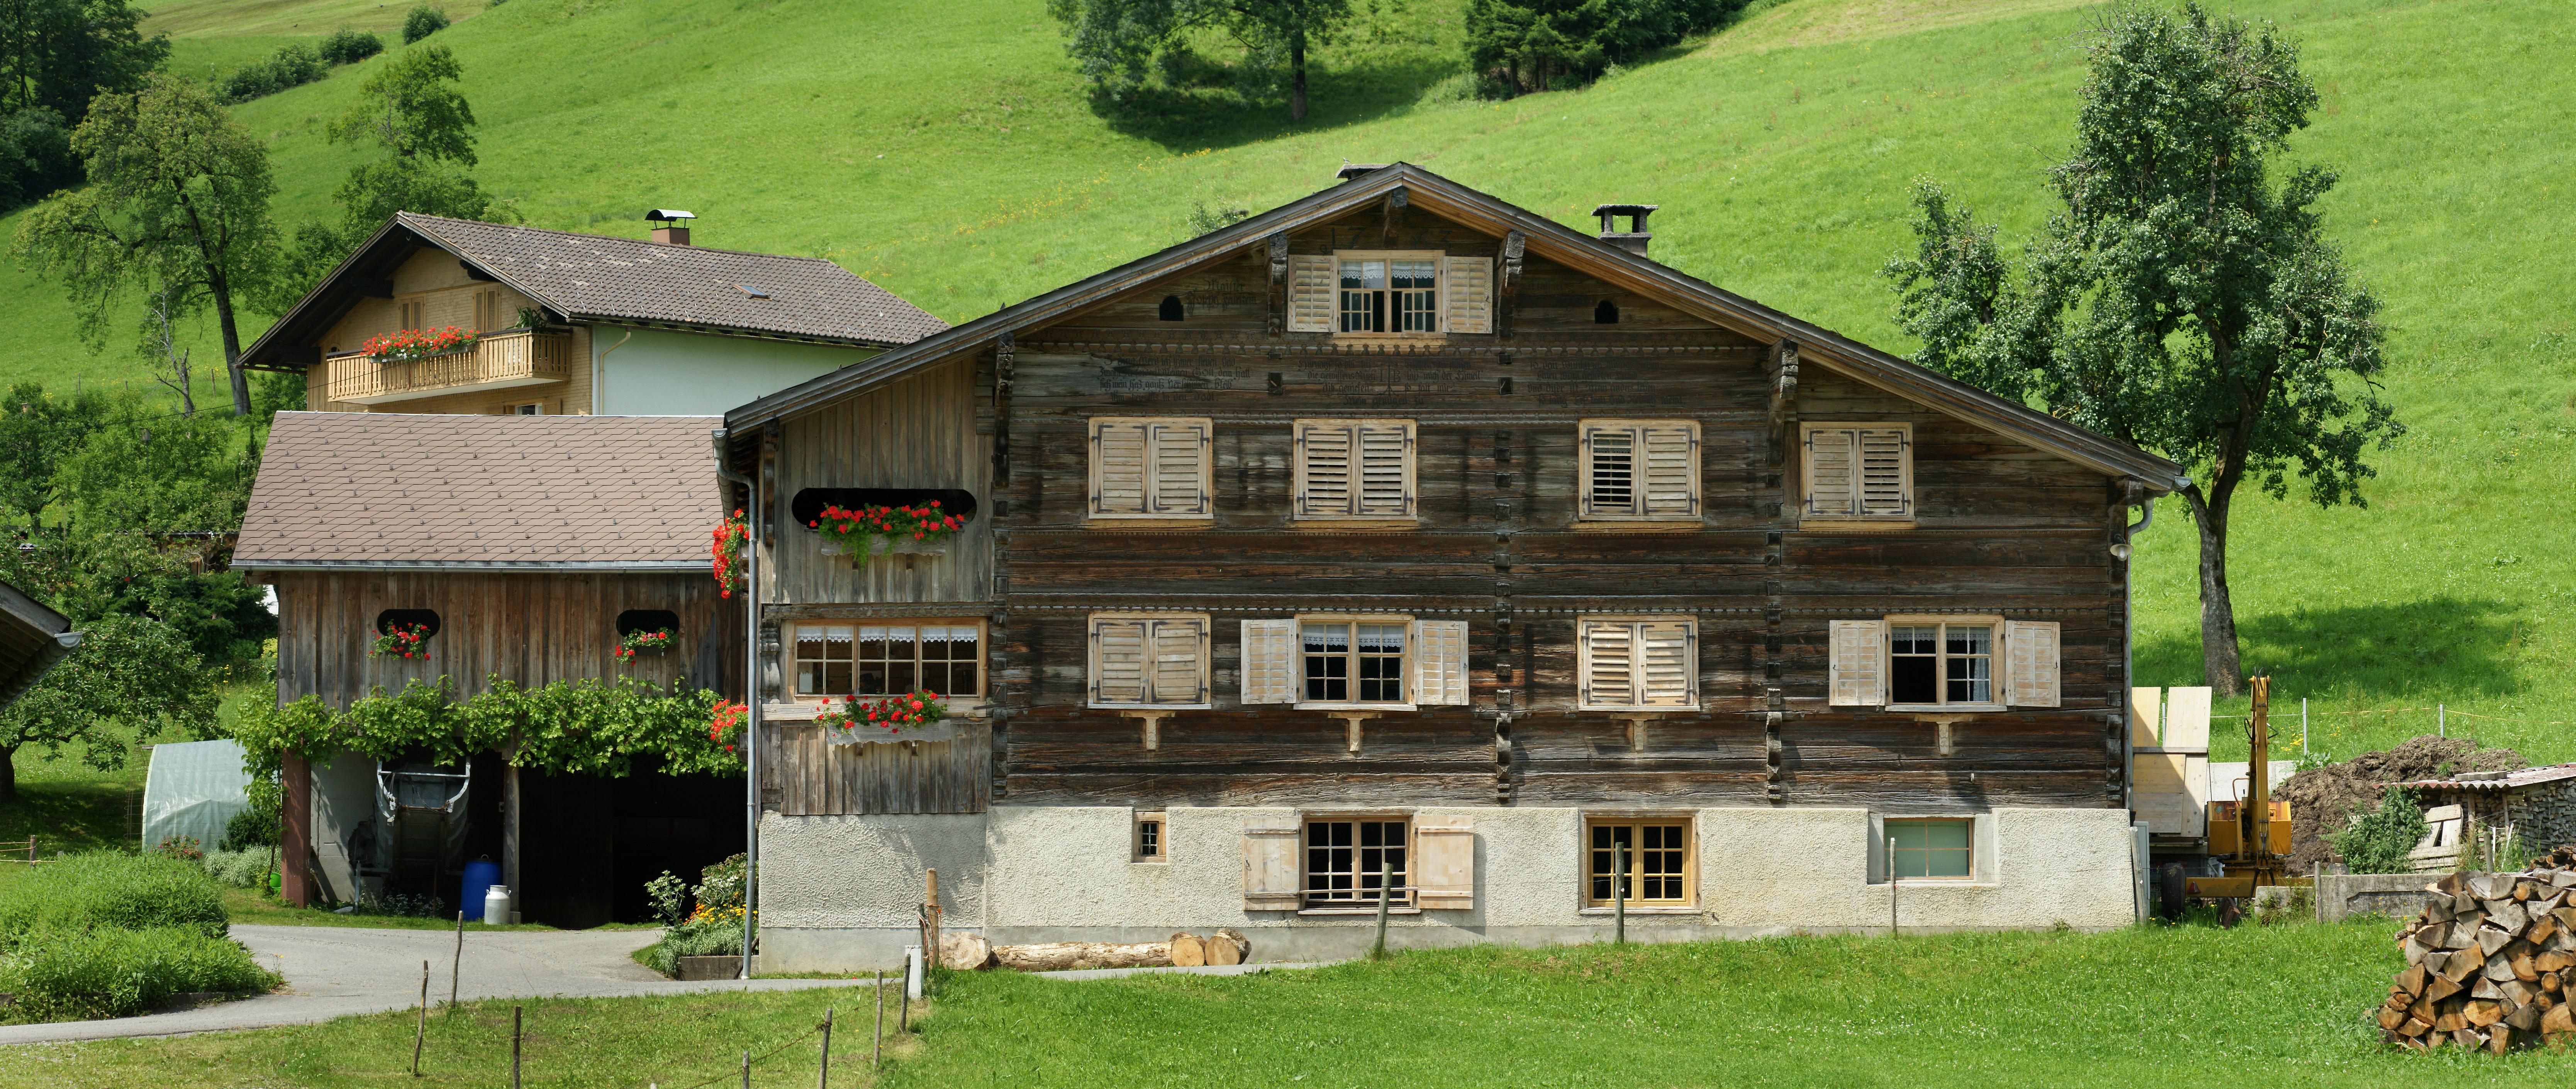 File einhof loch 266 schwarzenberg jpg wikimedia commons for Traditionelles haus